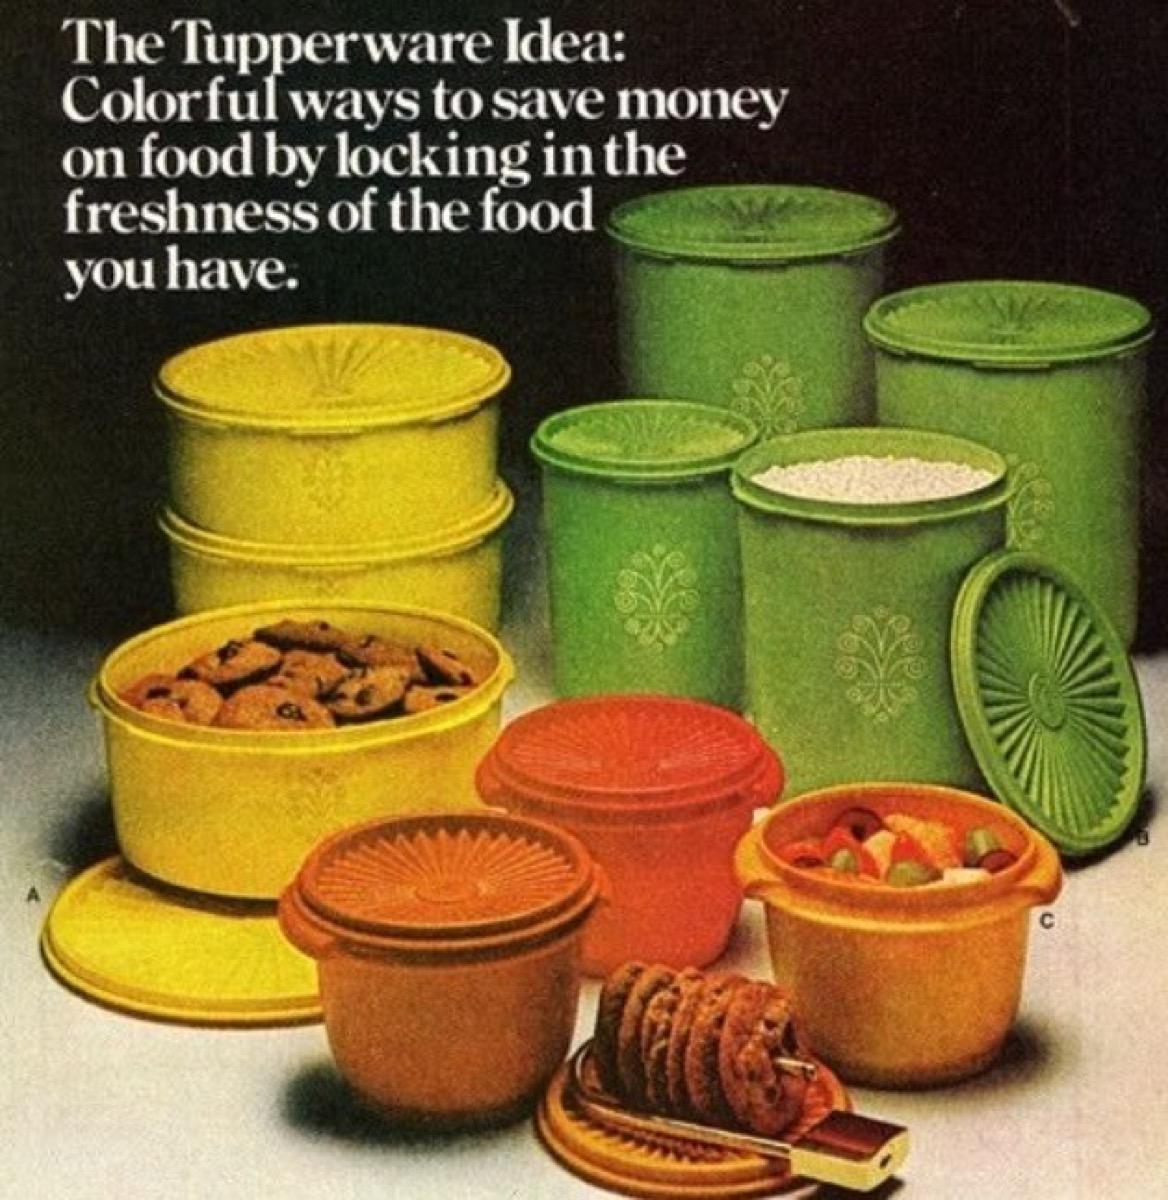 1970s-colorful-tupperware-ad